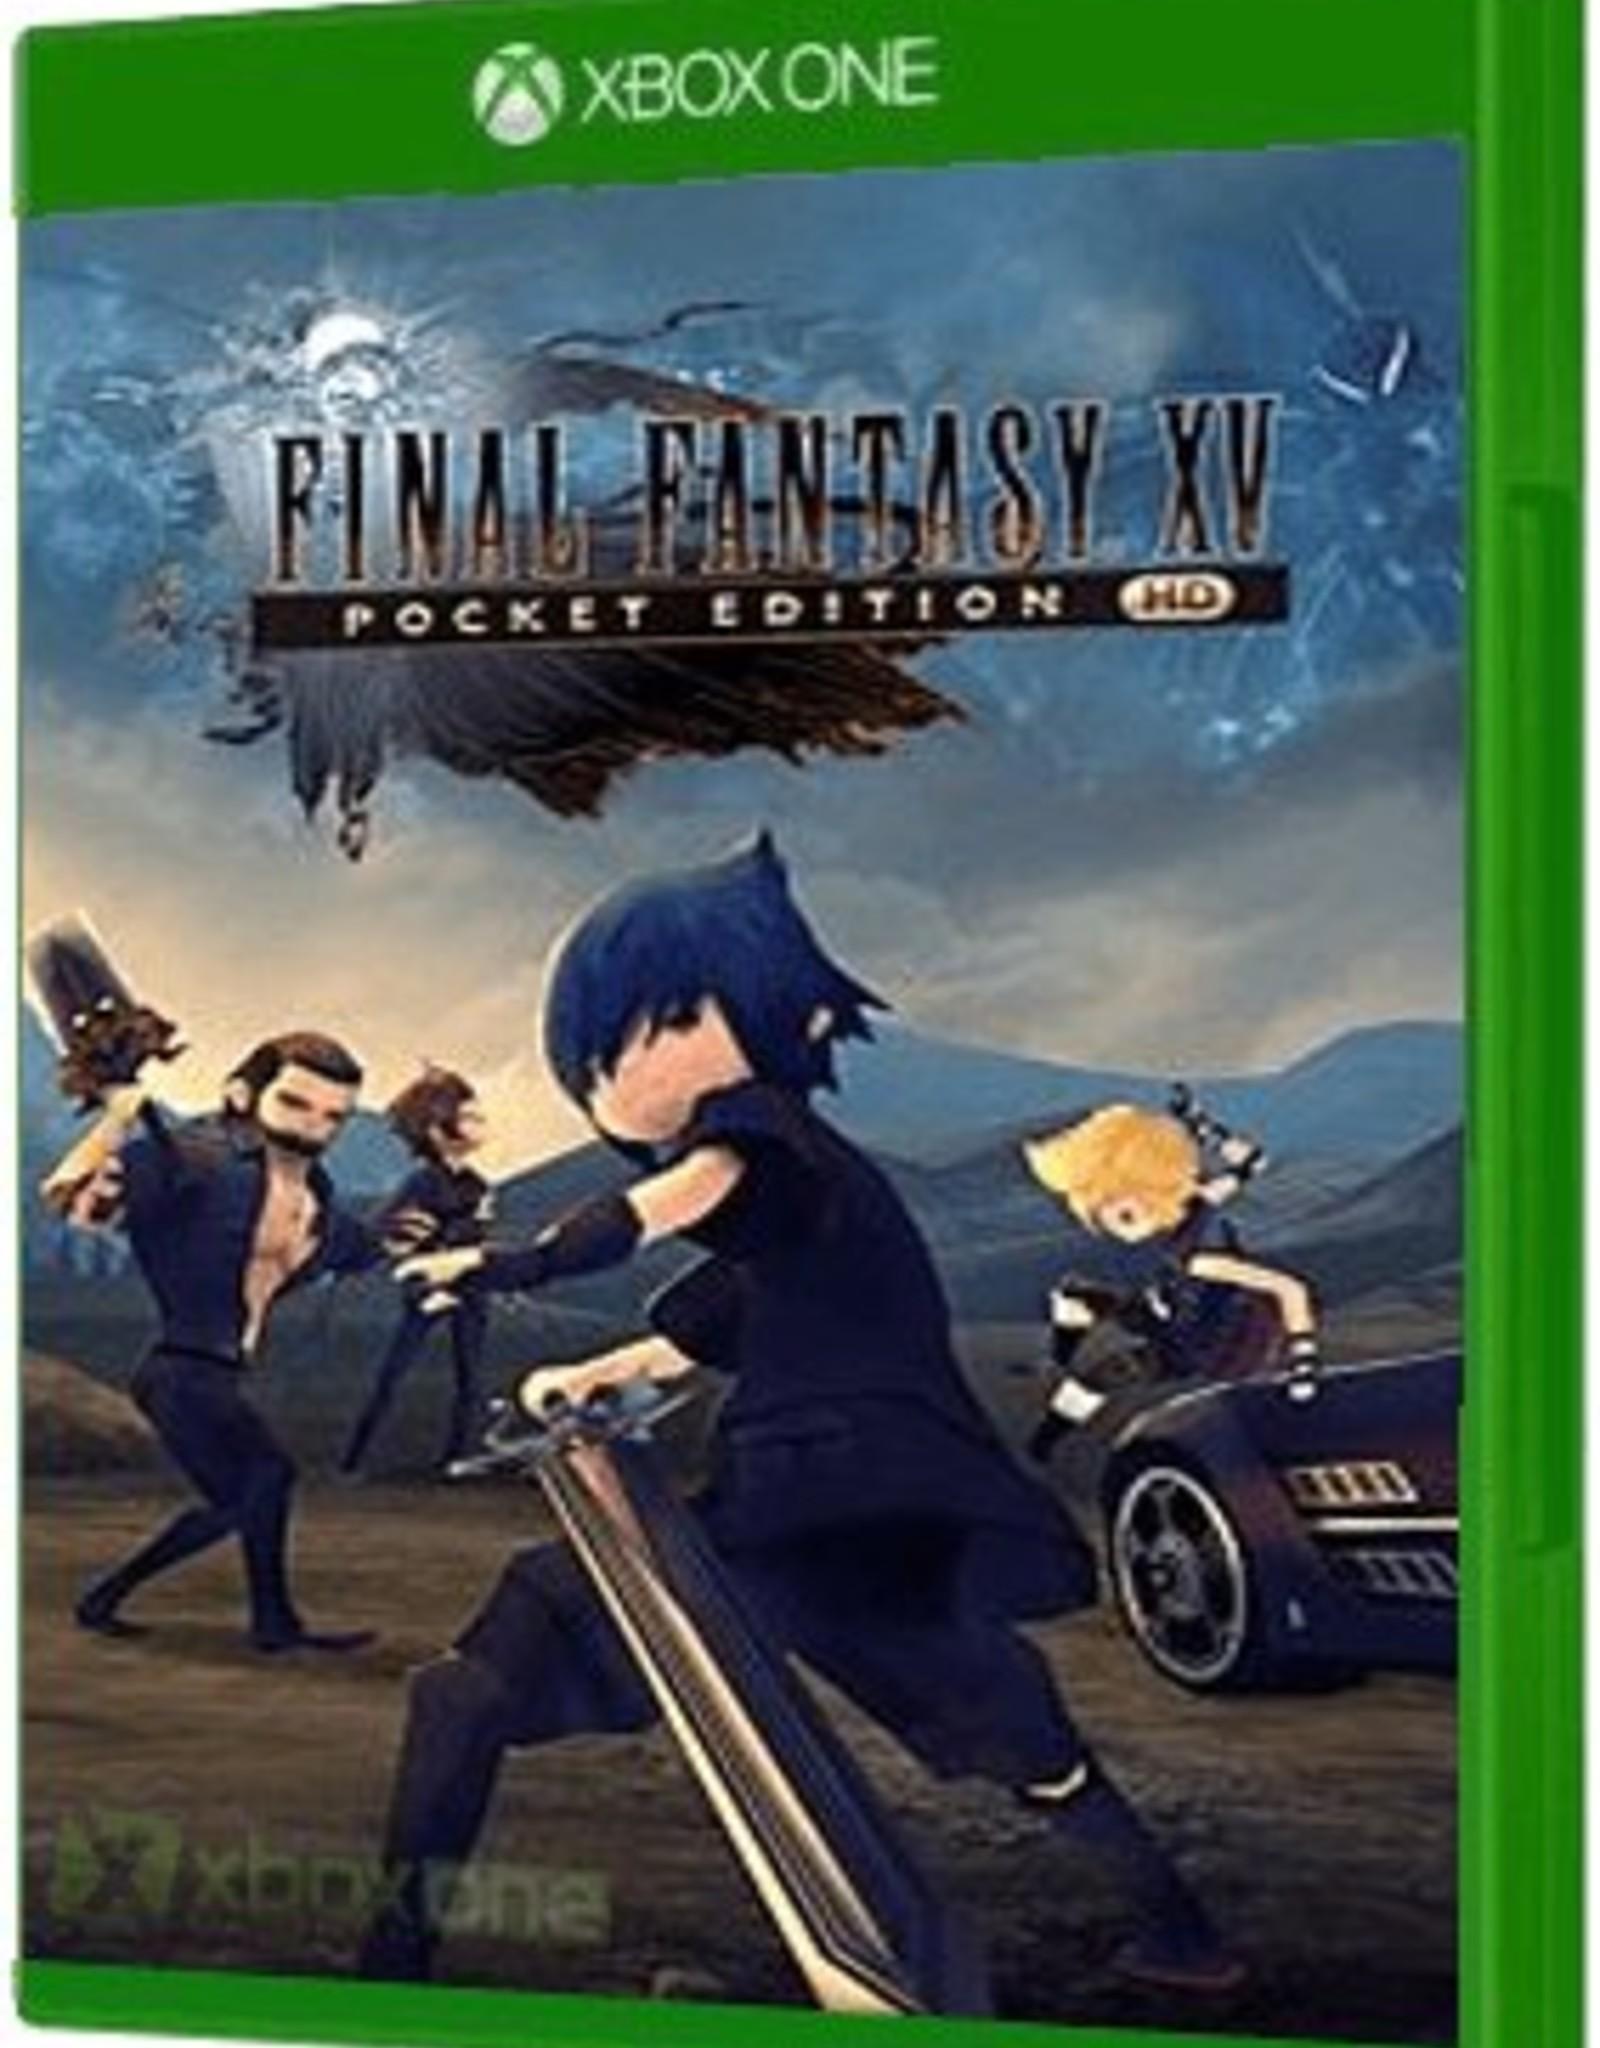 Final Fantasy XV Pocket Edition - XBOne DIGITAL